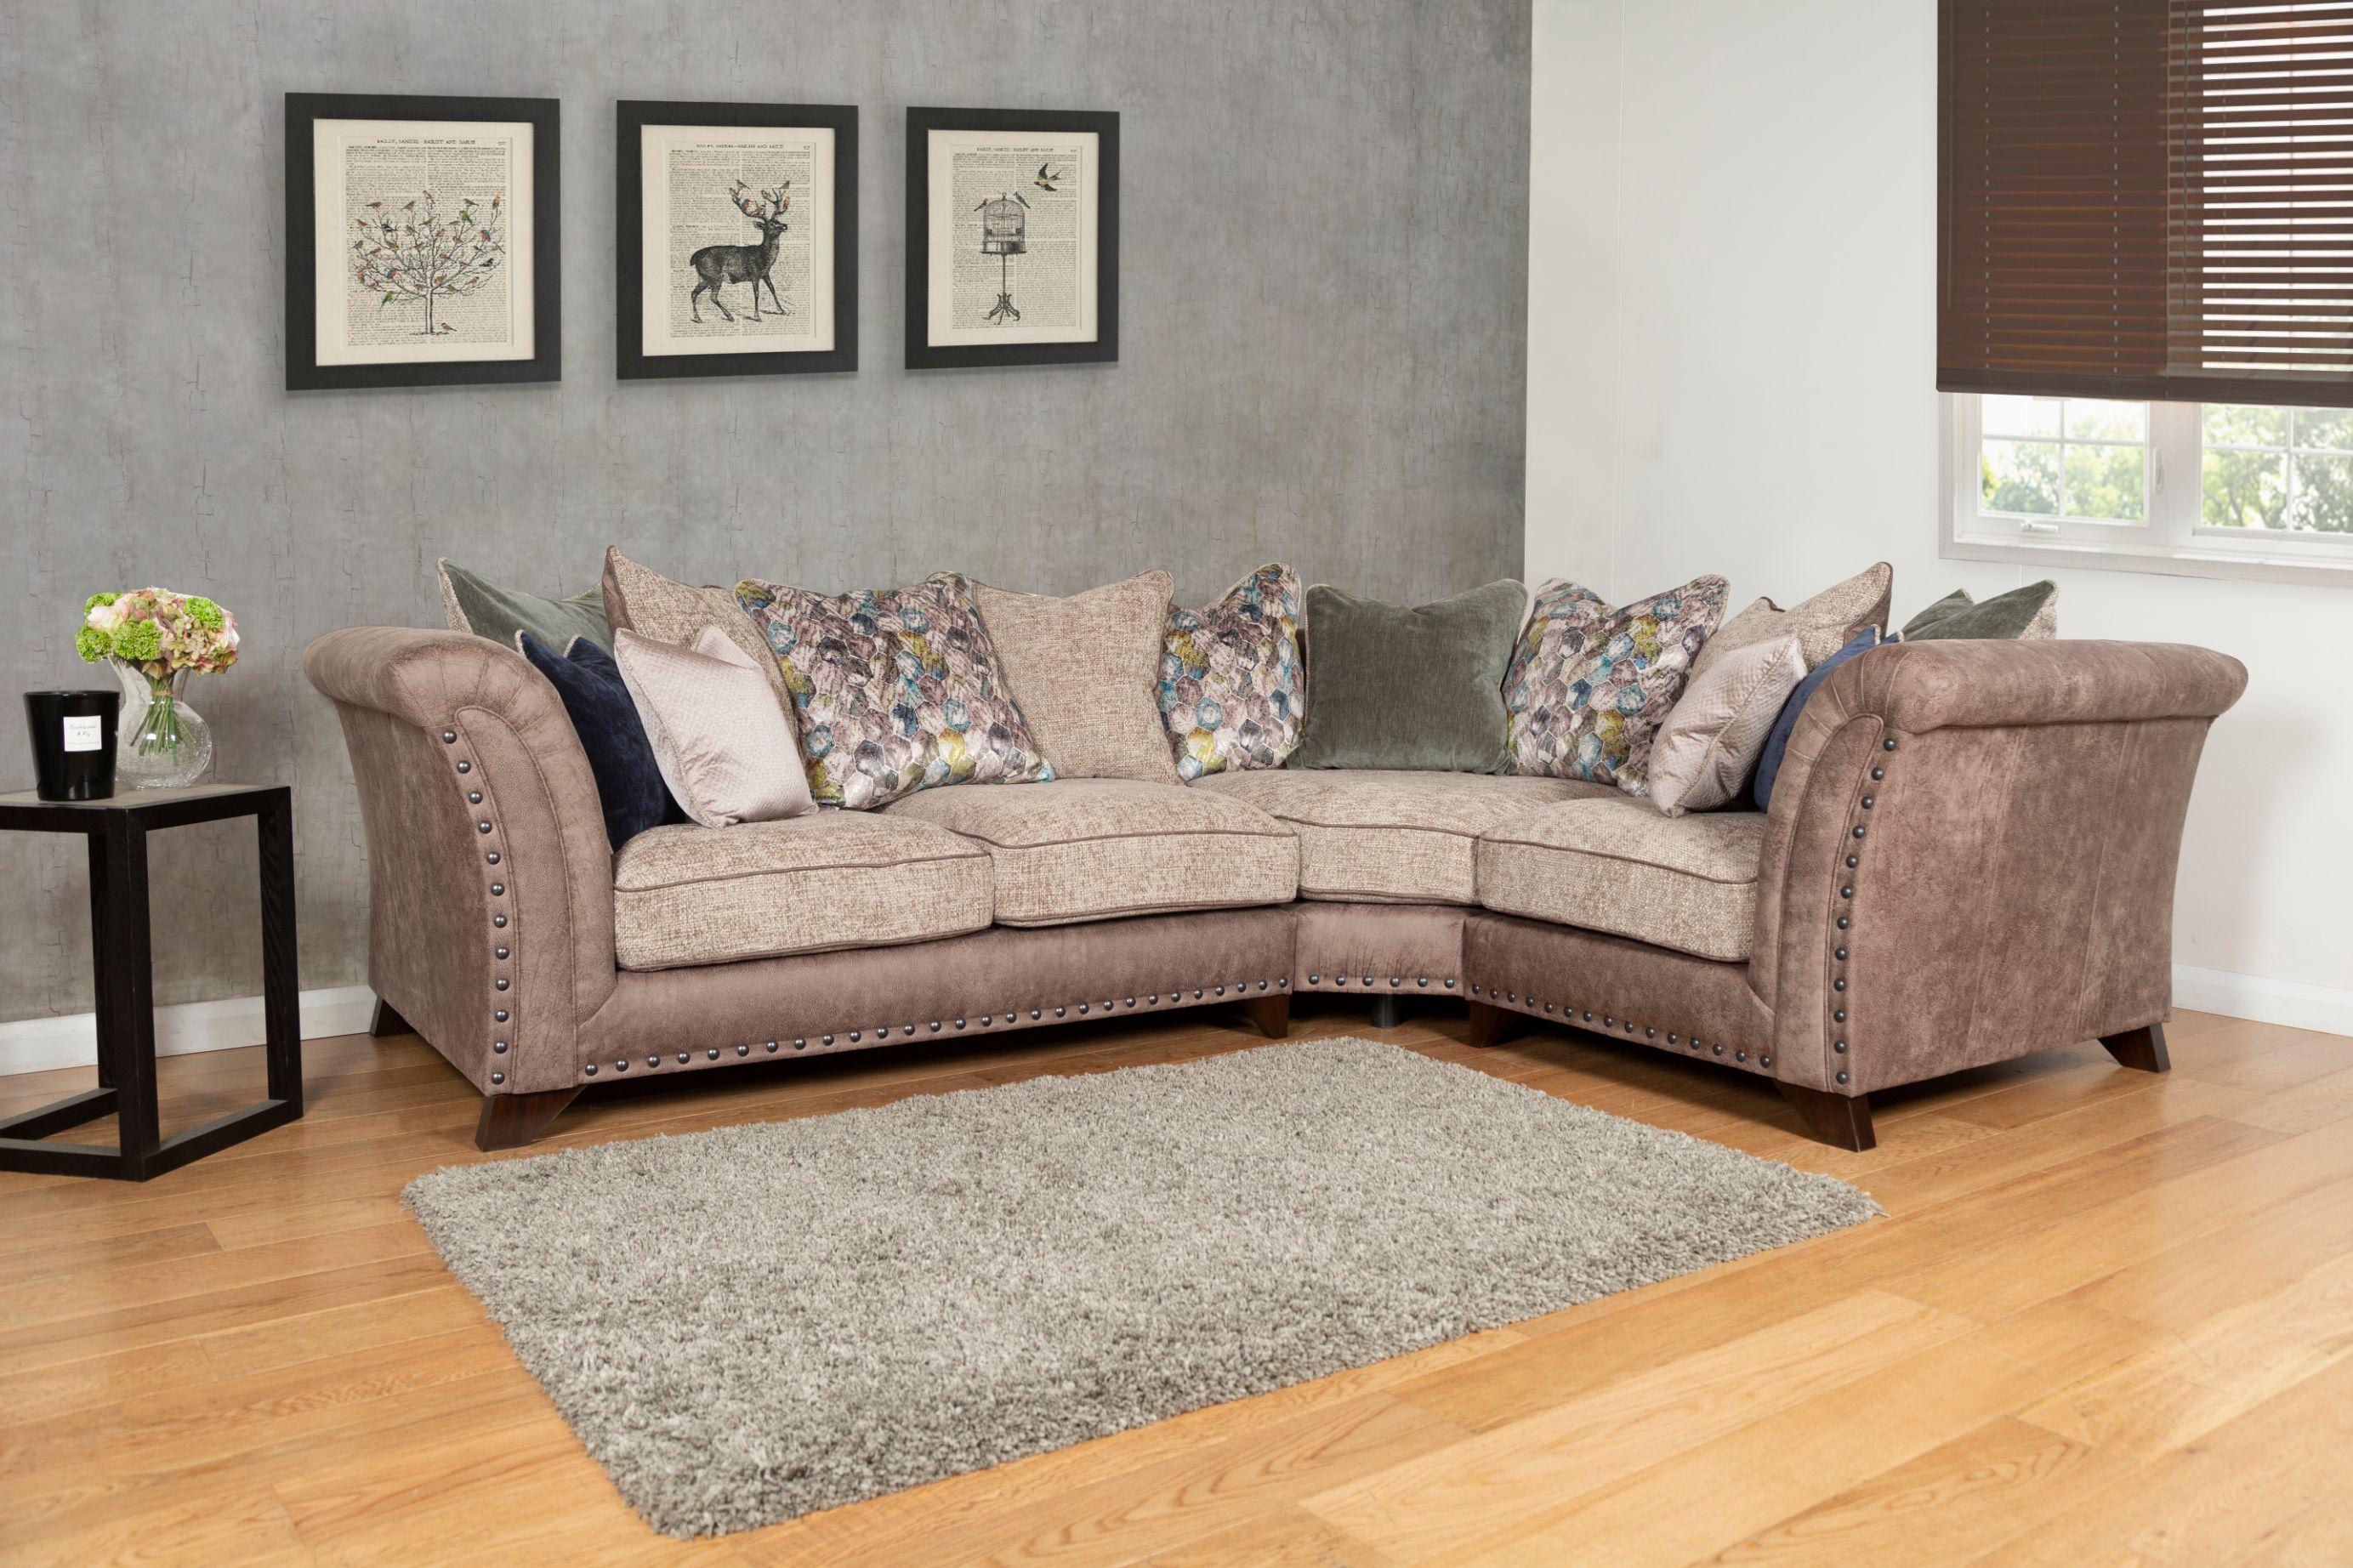 Buoyant Upholstery - Westminster